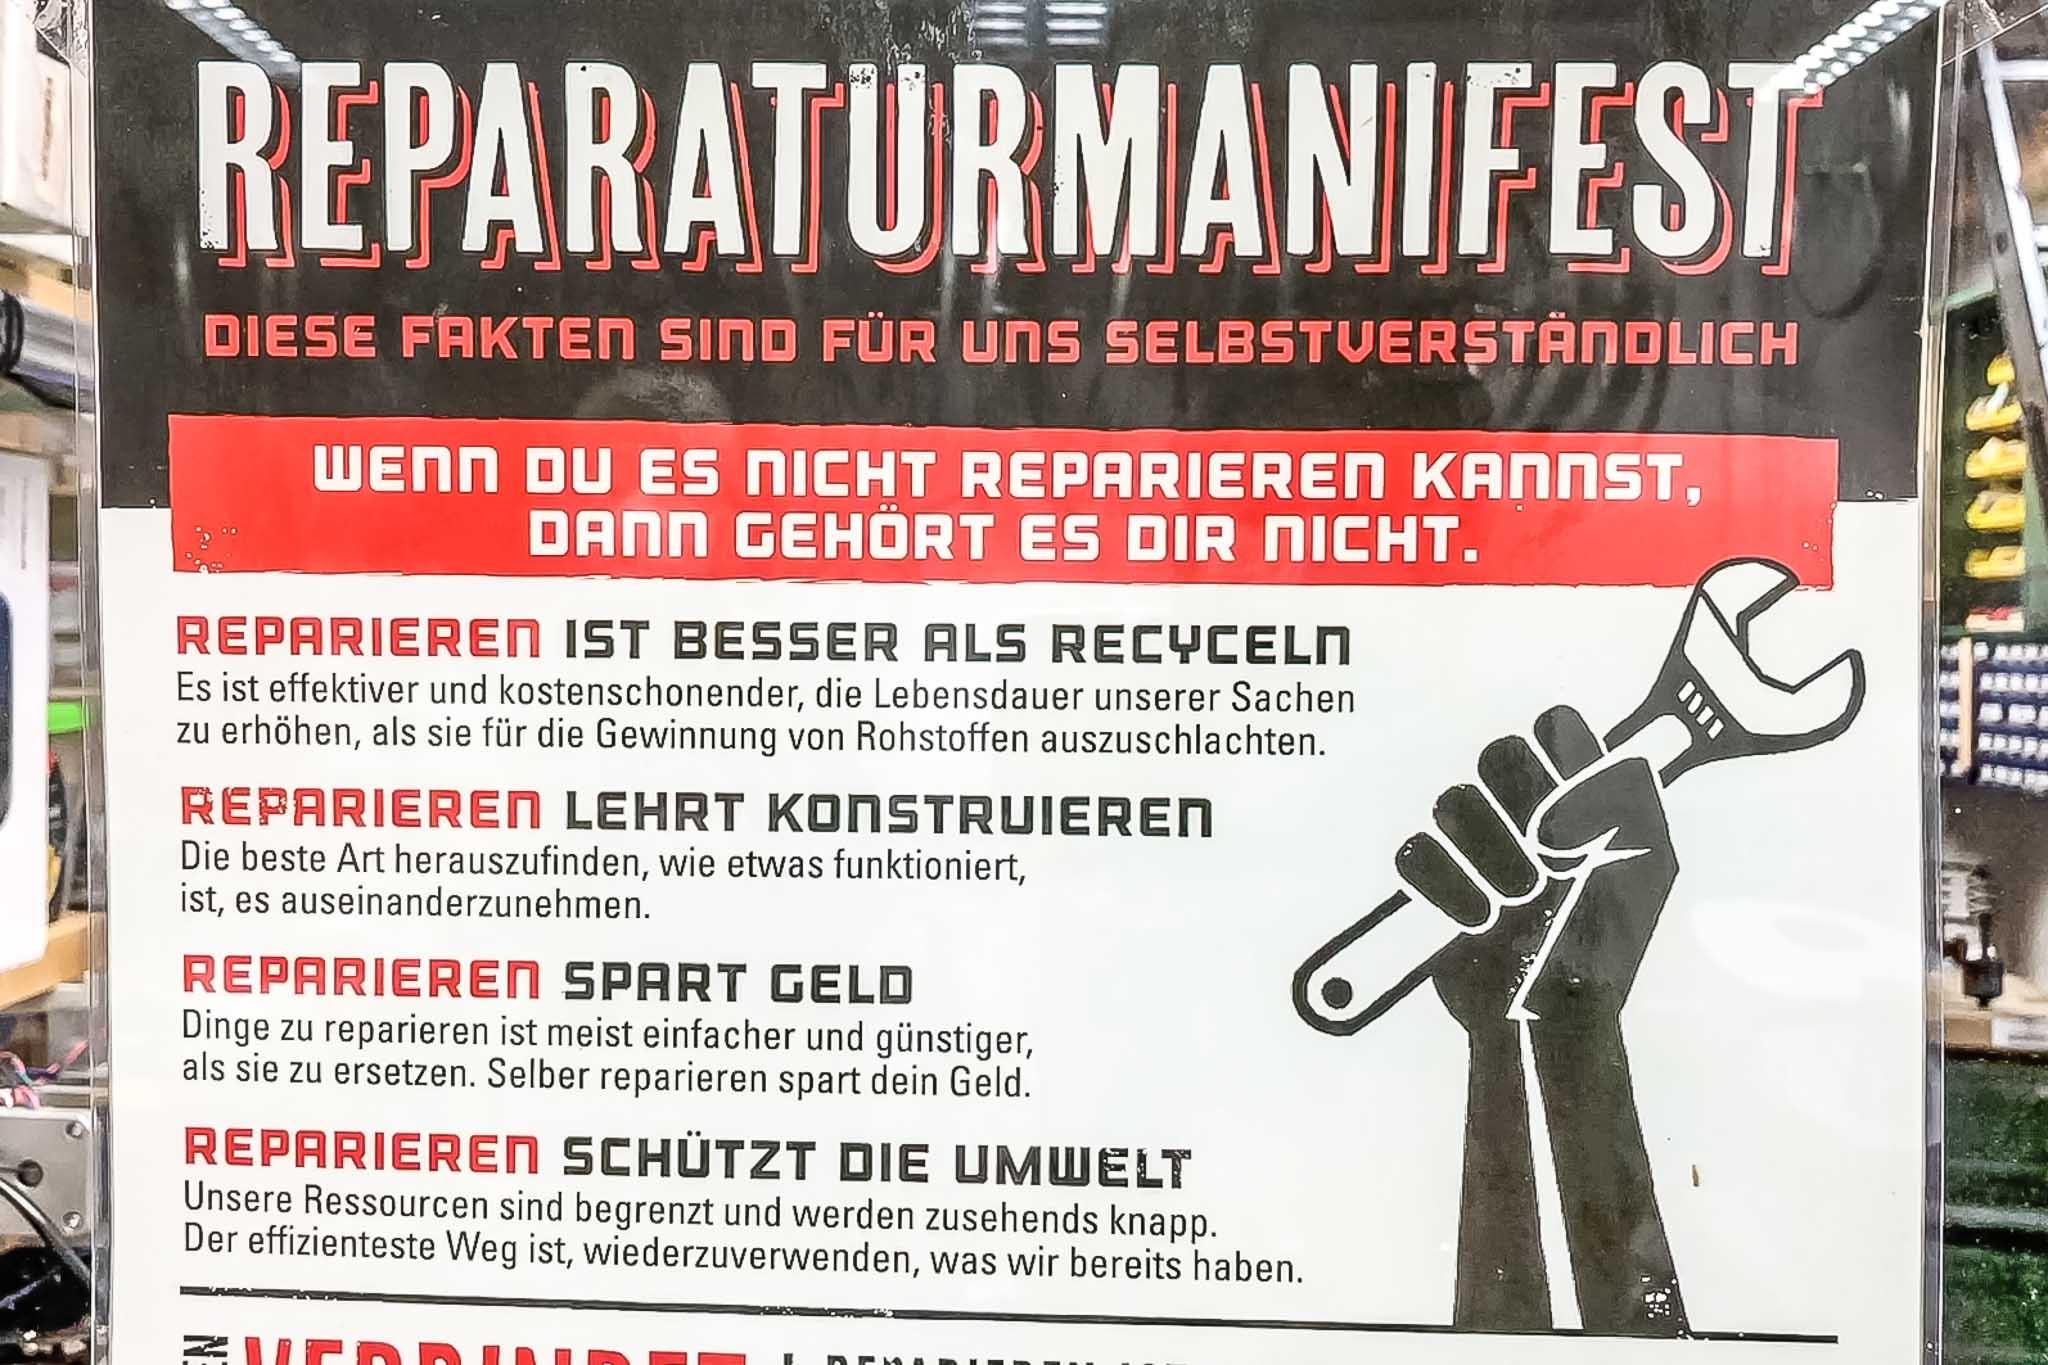 Plakat mit dem Reparaturmanifest